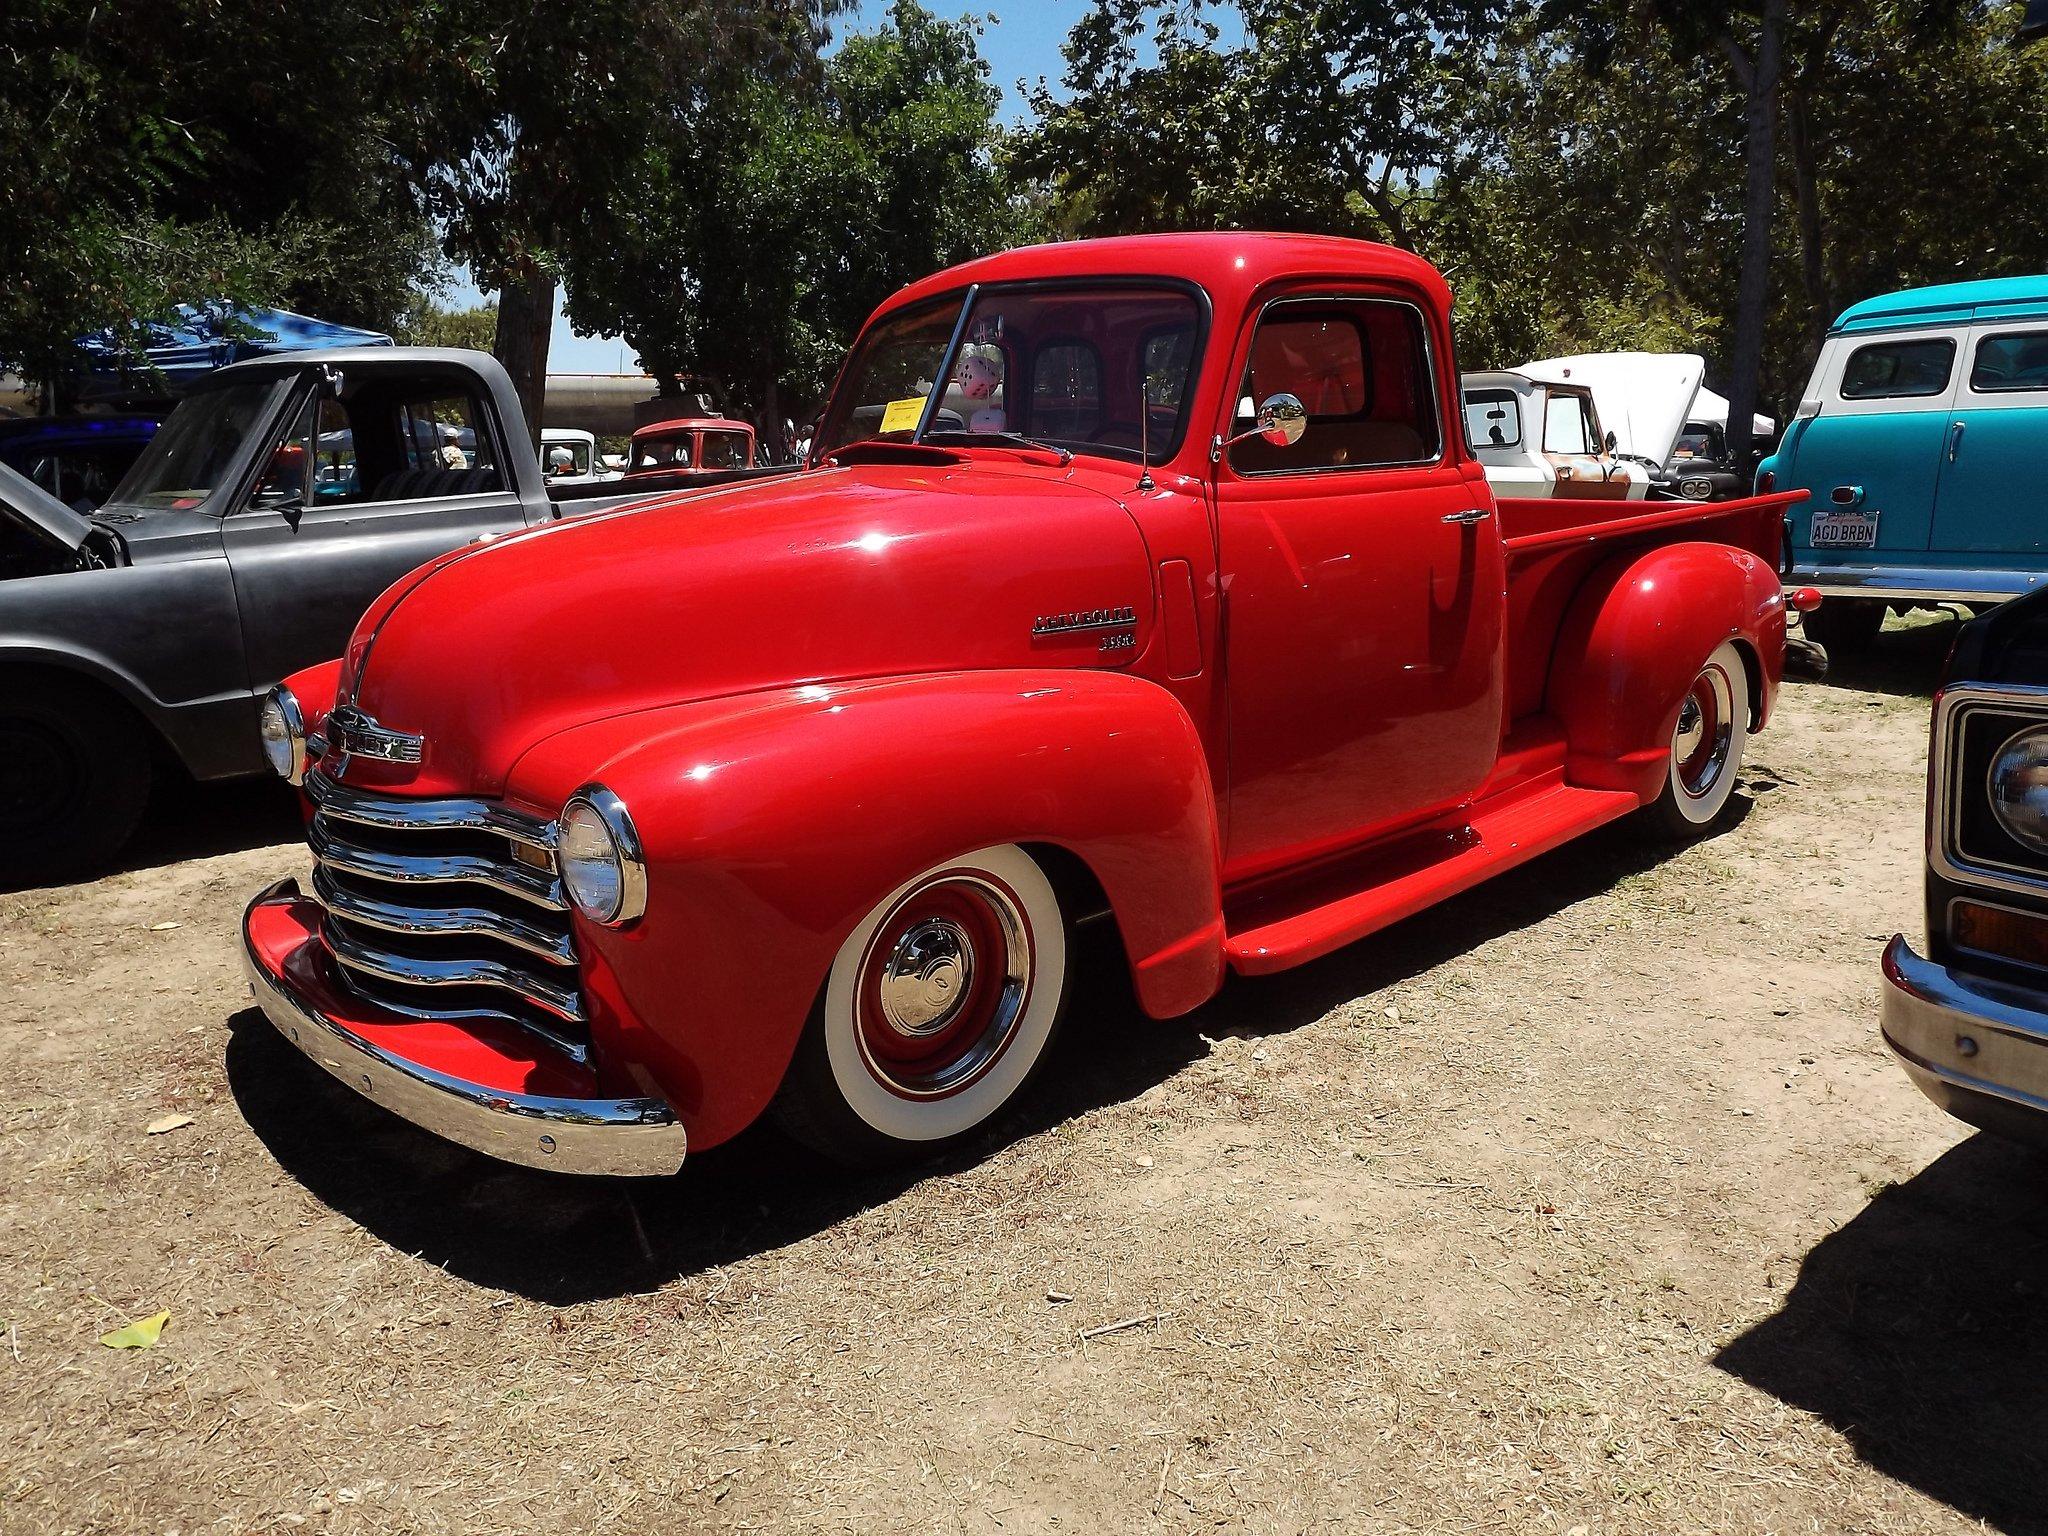 Chevrolet chevy old classic custom cars truck Pickup wallpaper 2048x1536